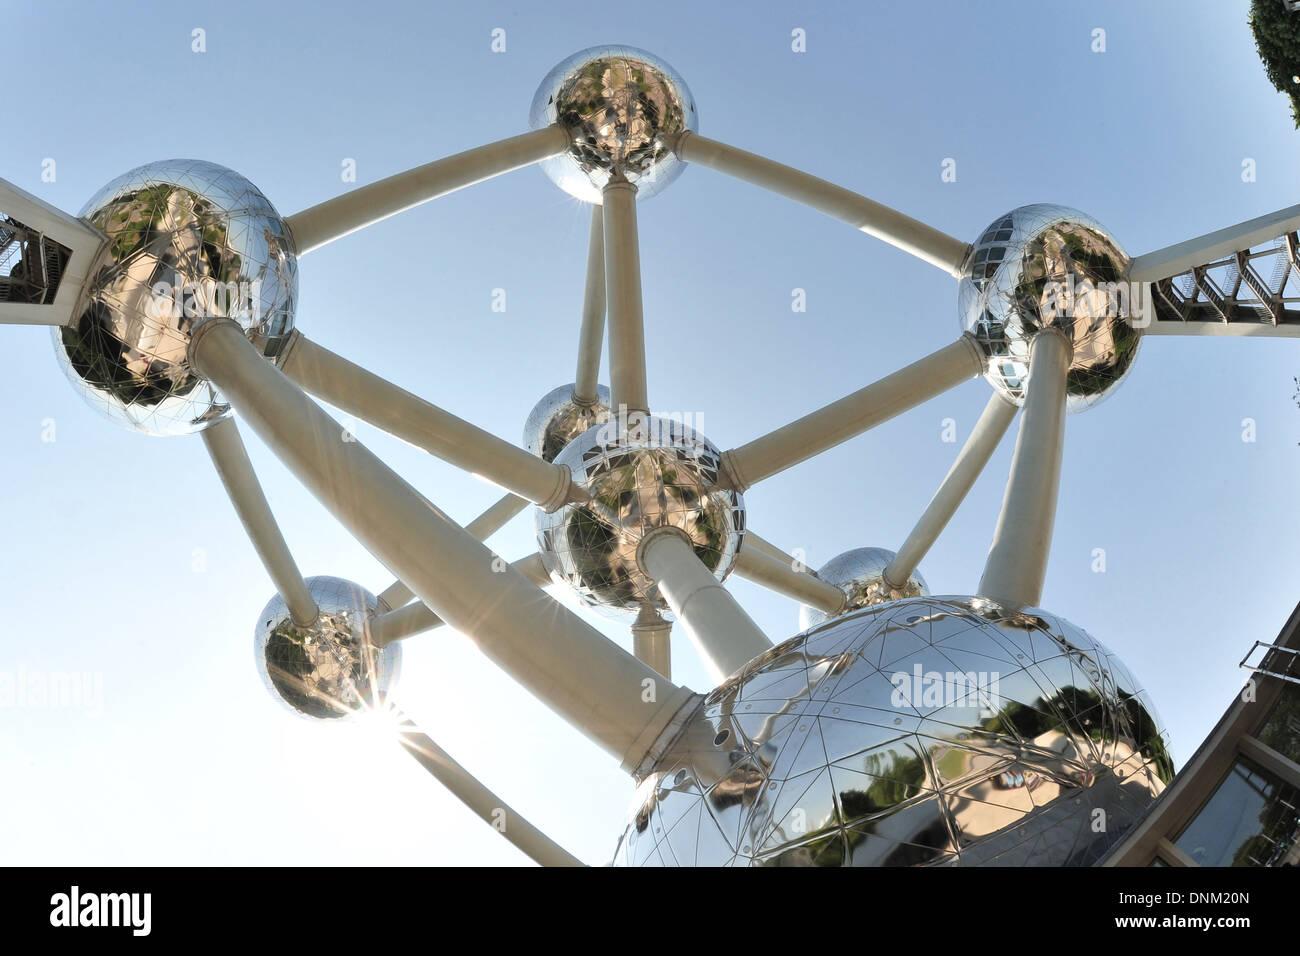 Brussels, Belgium, the Atomium gleams in the sunlight - Stock Image